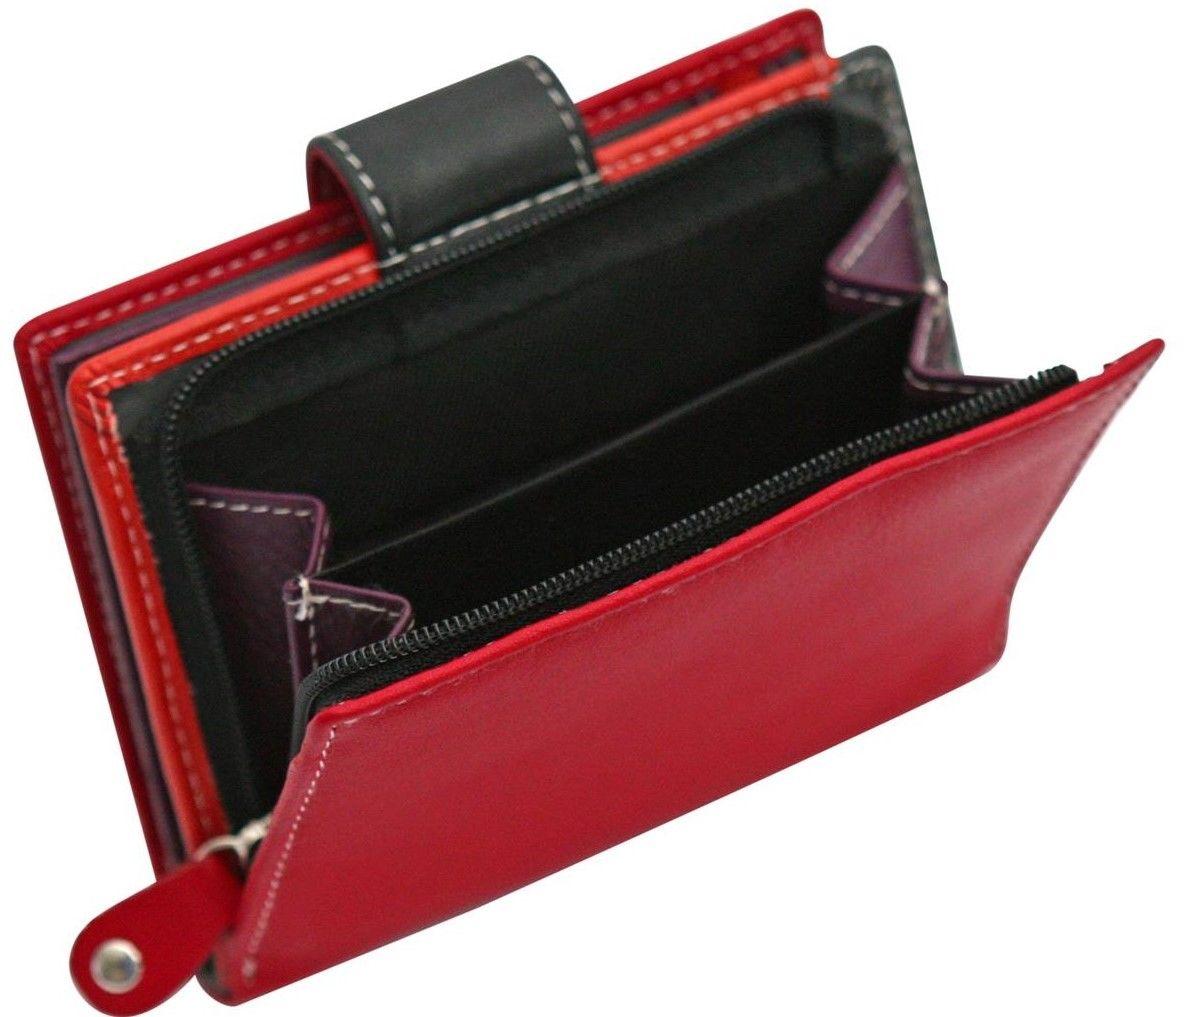 Felda-RFID-onorevoli-MEDAGLIA-amp-Card-Purse-Wallet-Genuine-Leather-Multi-SOFT-BOX-REGALO miniatura 105